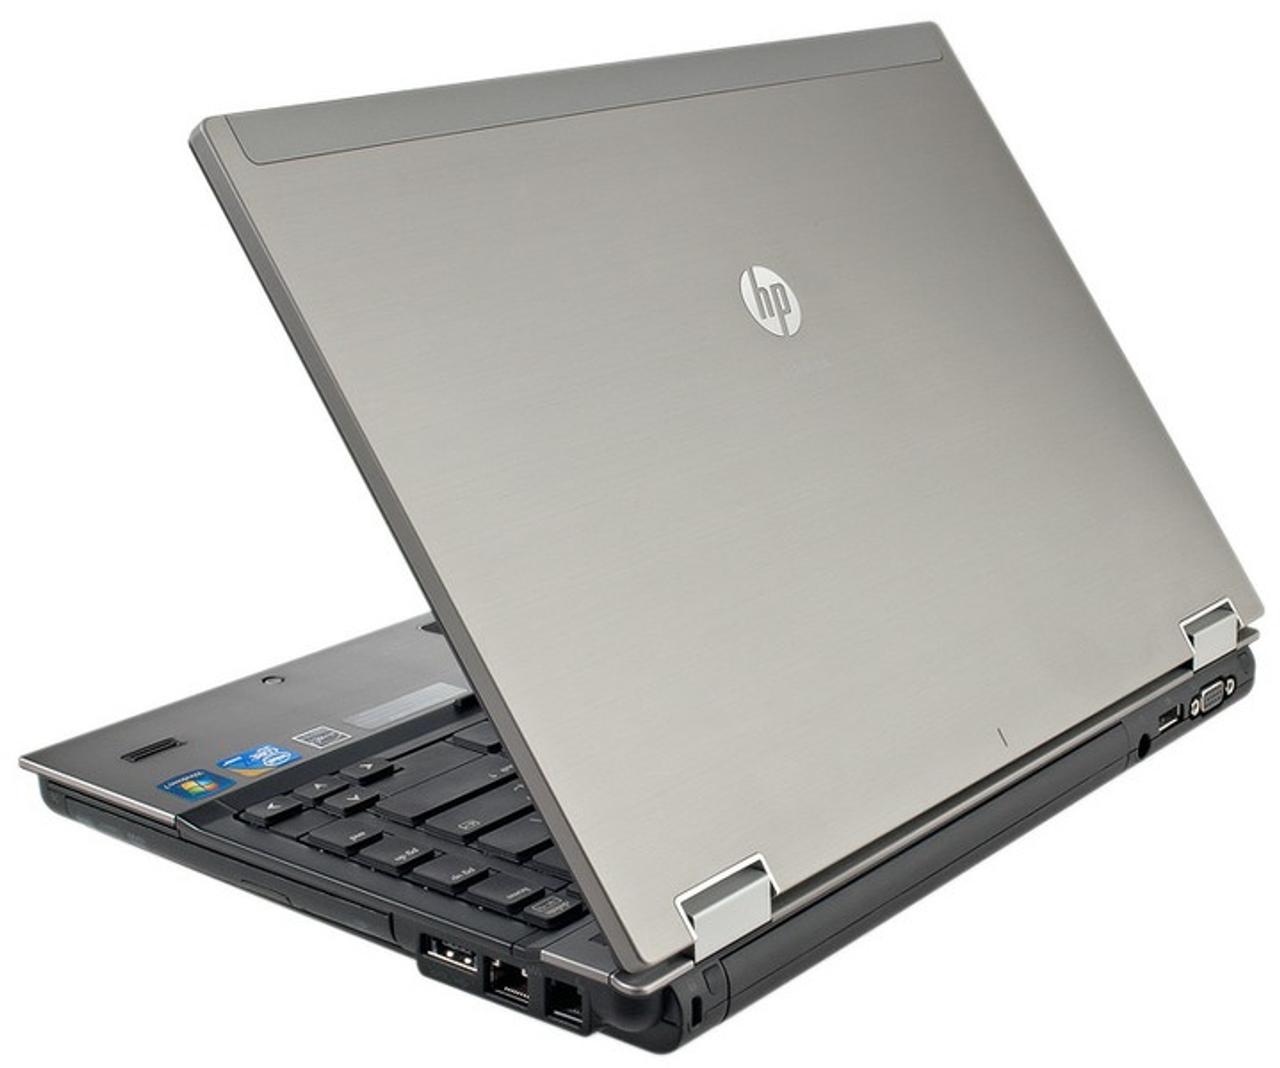 HP Compaq Elitebook 8440p Laptop Core i7 2.8GHz, 4GB Ram, 320GB HDD, DVD-RW, Notebook Windows 7 Pro 64 Notebook